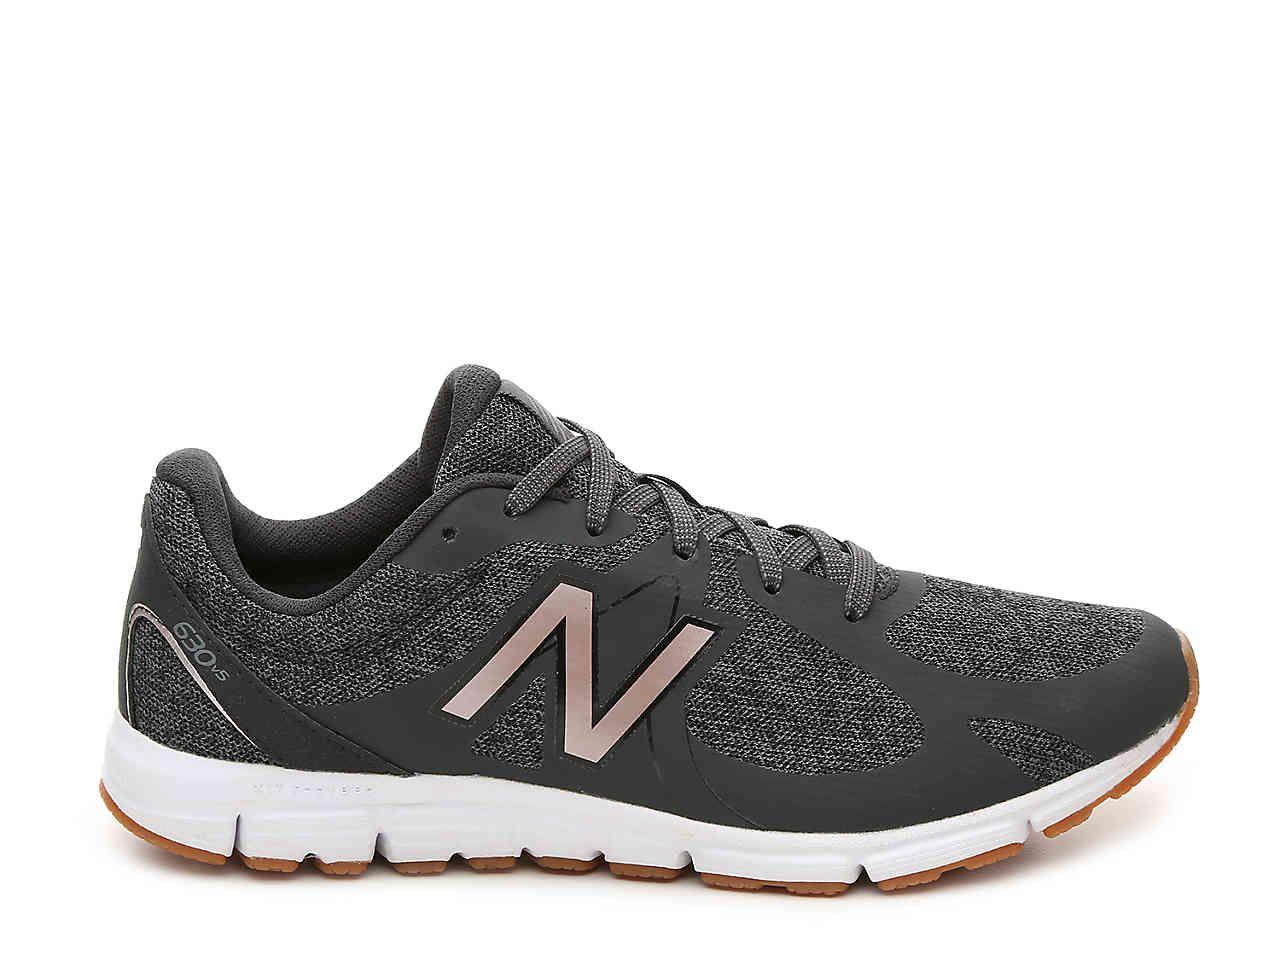 3680f15ab7ece New Balance 630 V5 Lightweight Running Shoe - Women's Women's Shoes | DSW